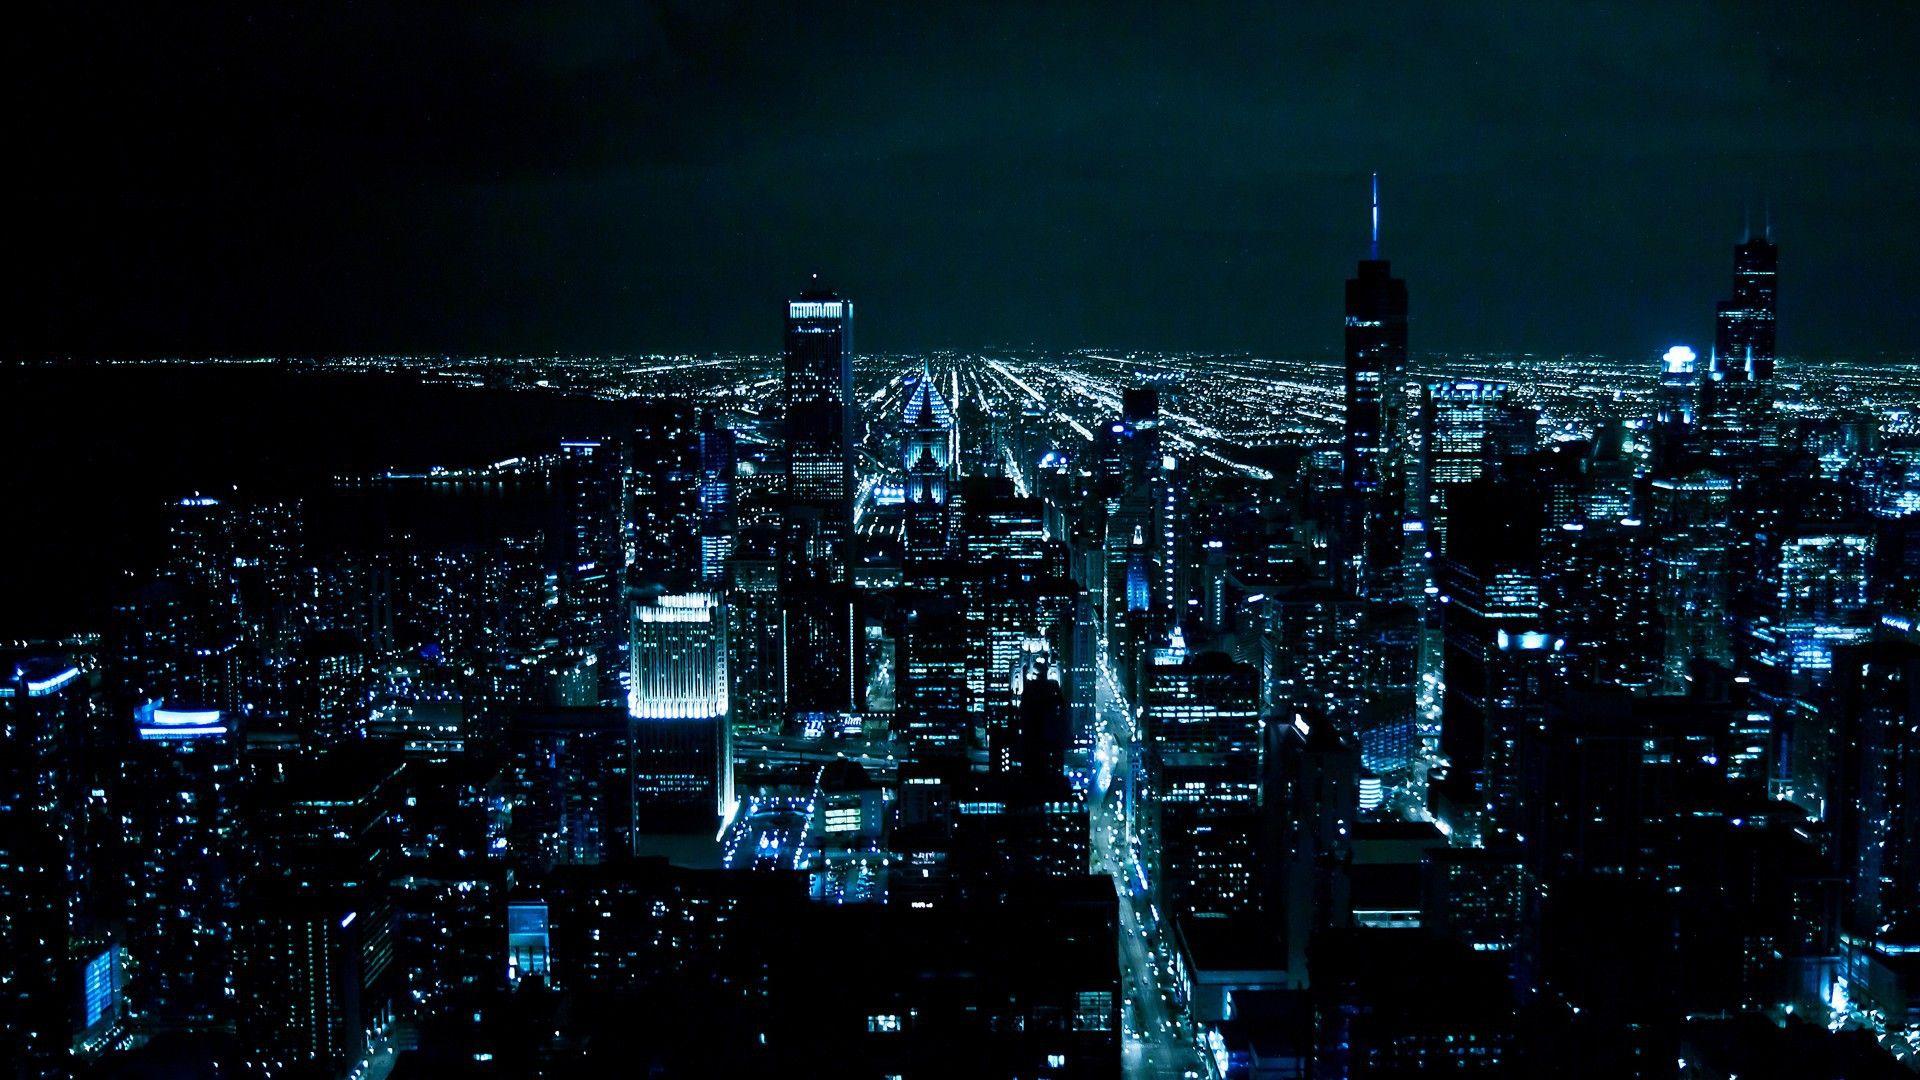 pin city nightlife wallpaper - photo #2